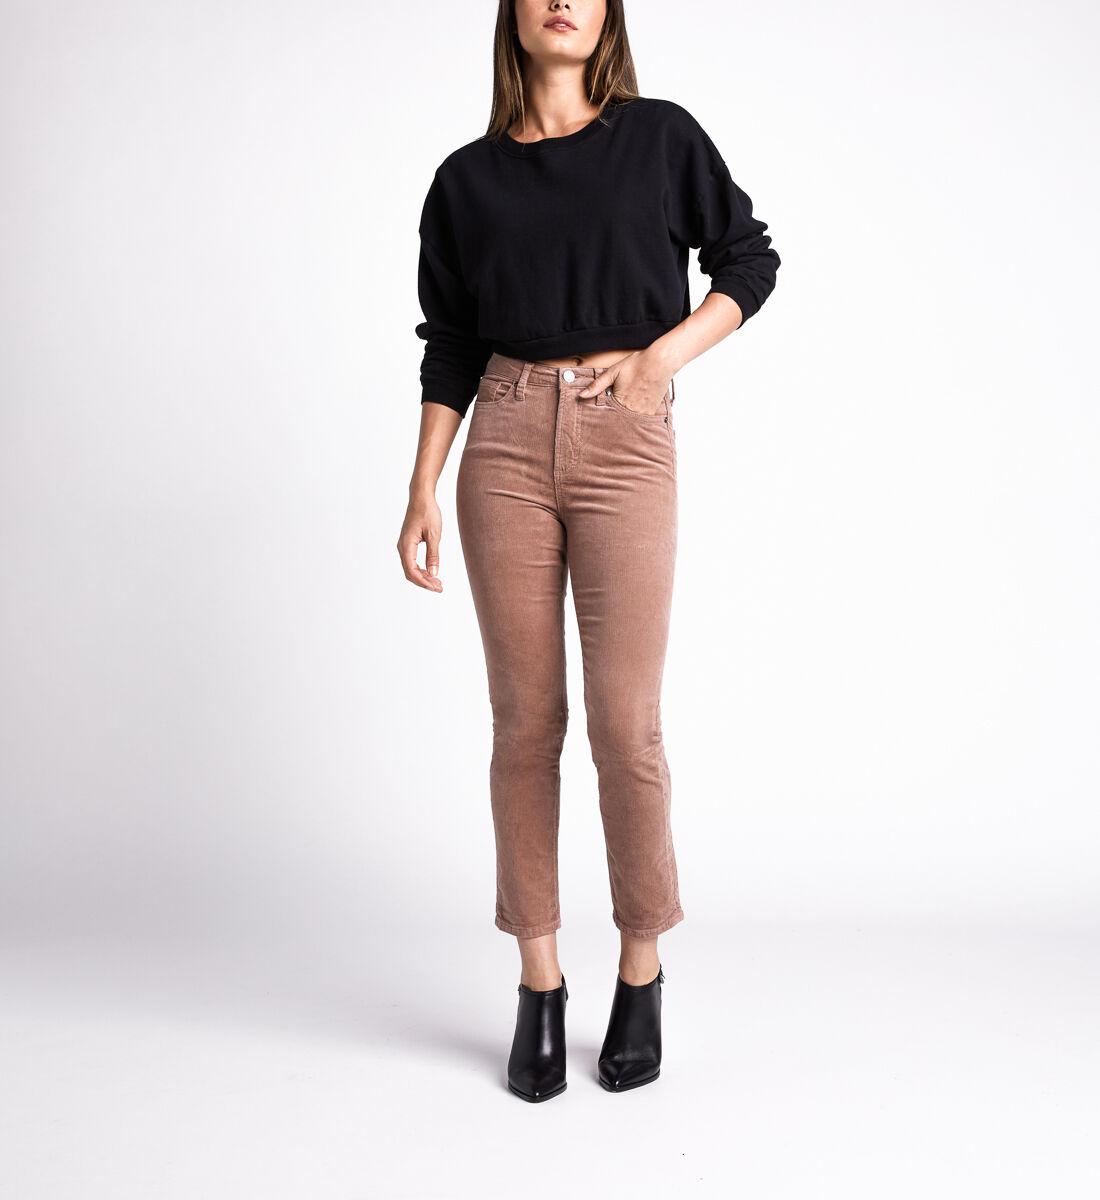 High Note High Rise Slim Leg Pants,Blush Alt Image 1